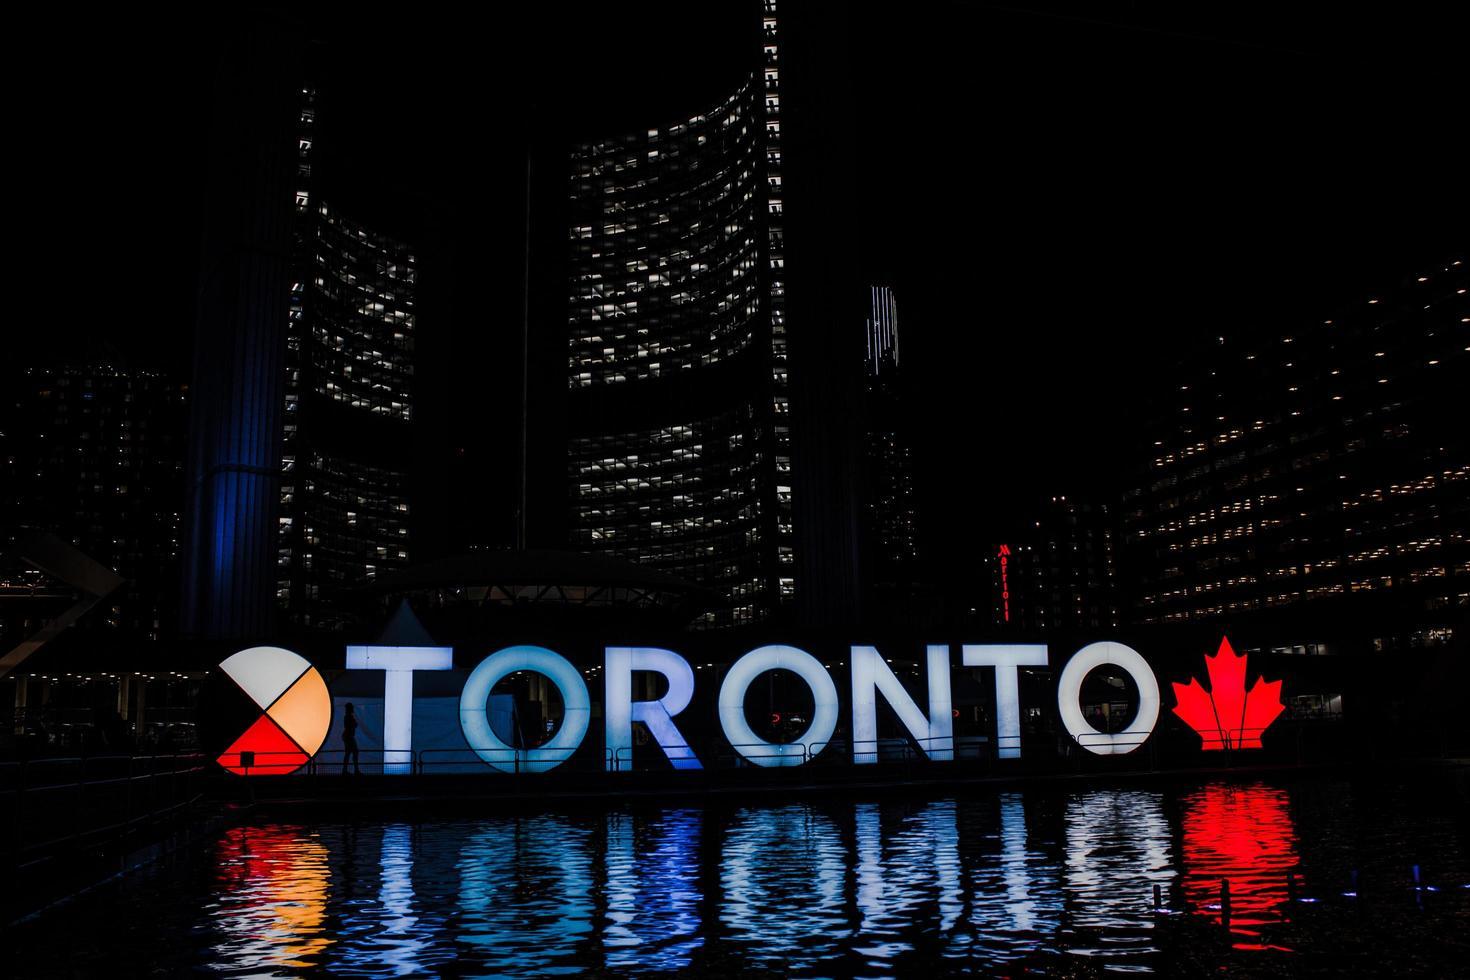 Toronto, Ontario, Canada, 2020 - Signe de toronto 3d la nuit photo